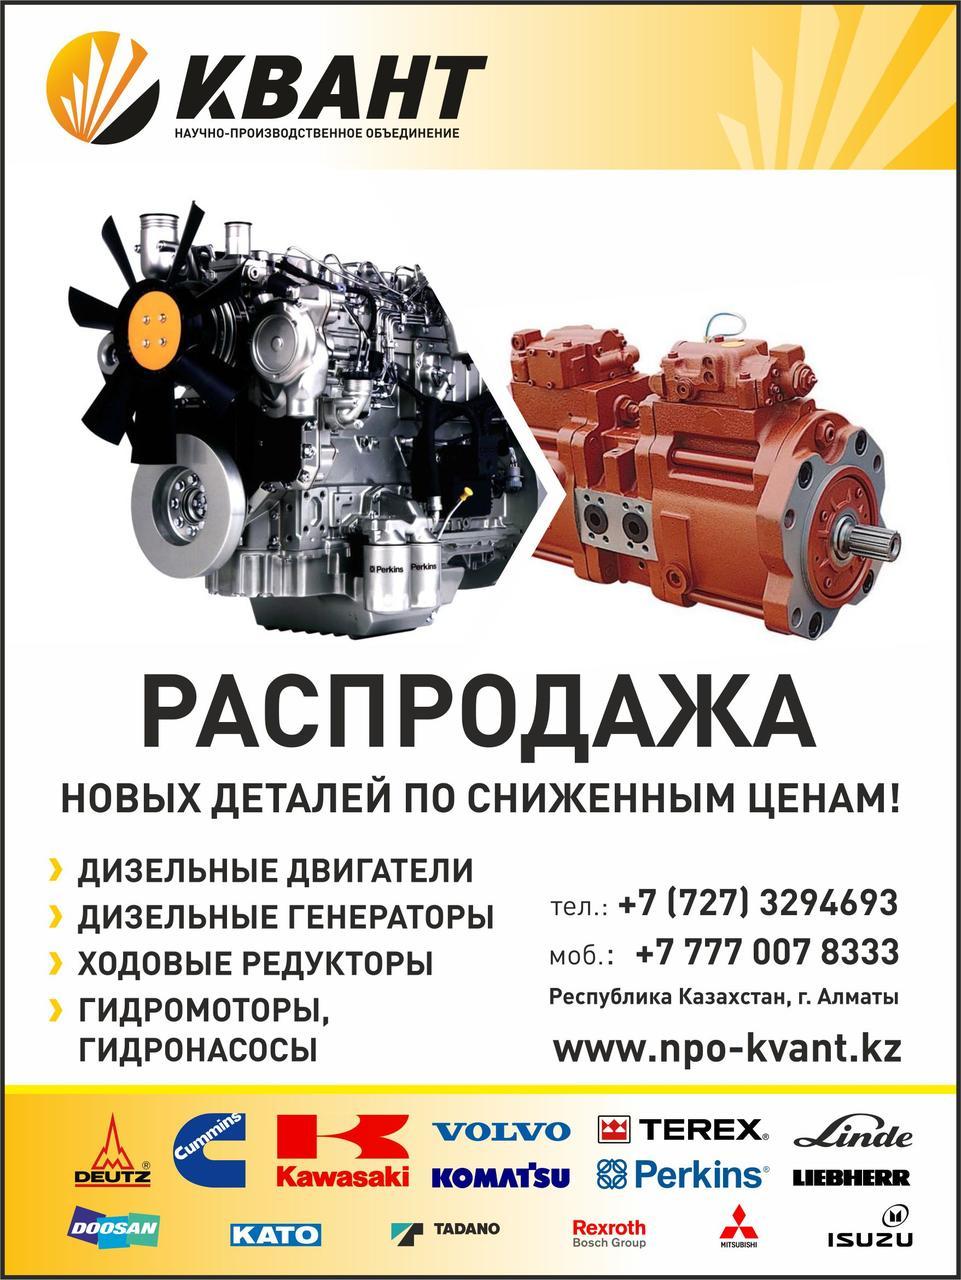 Двигатель Volvo D7E LB E3, Volvo D12C380, Volvo D60, Volvo D70, Volvo D10B, Volvo D100, Volvo D10 BLAE2